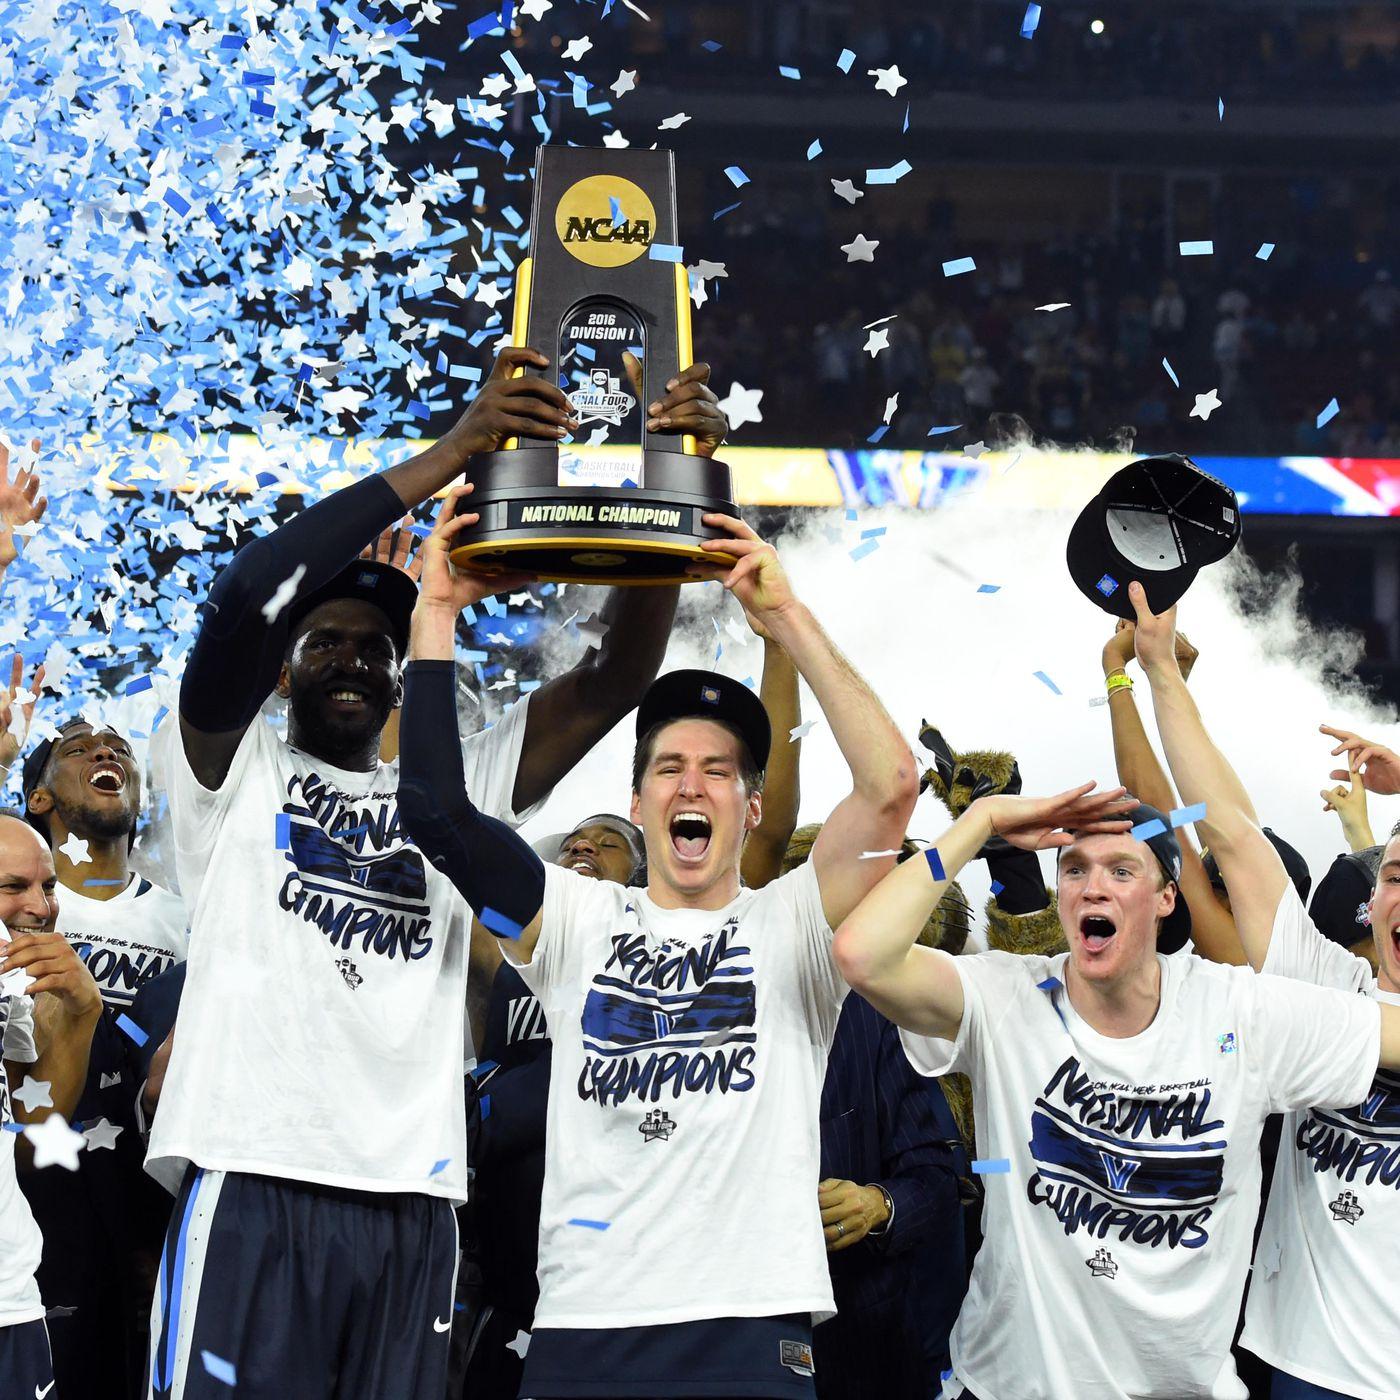 Basketball championship photo